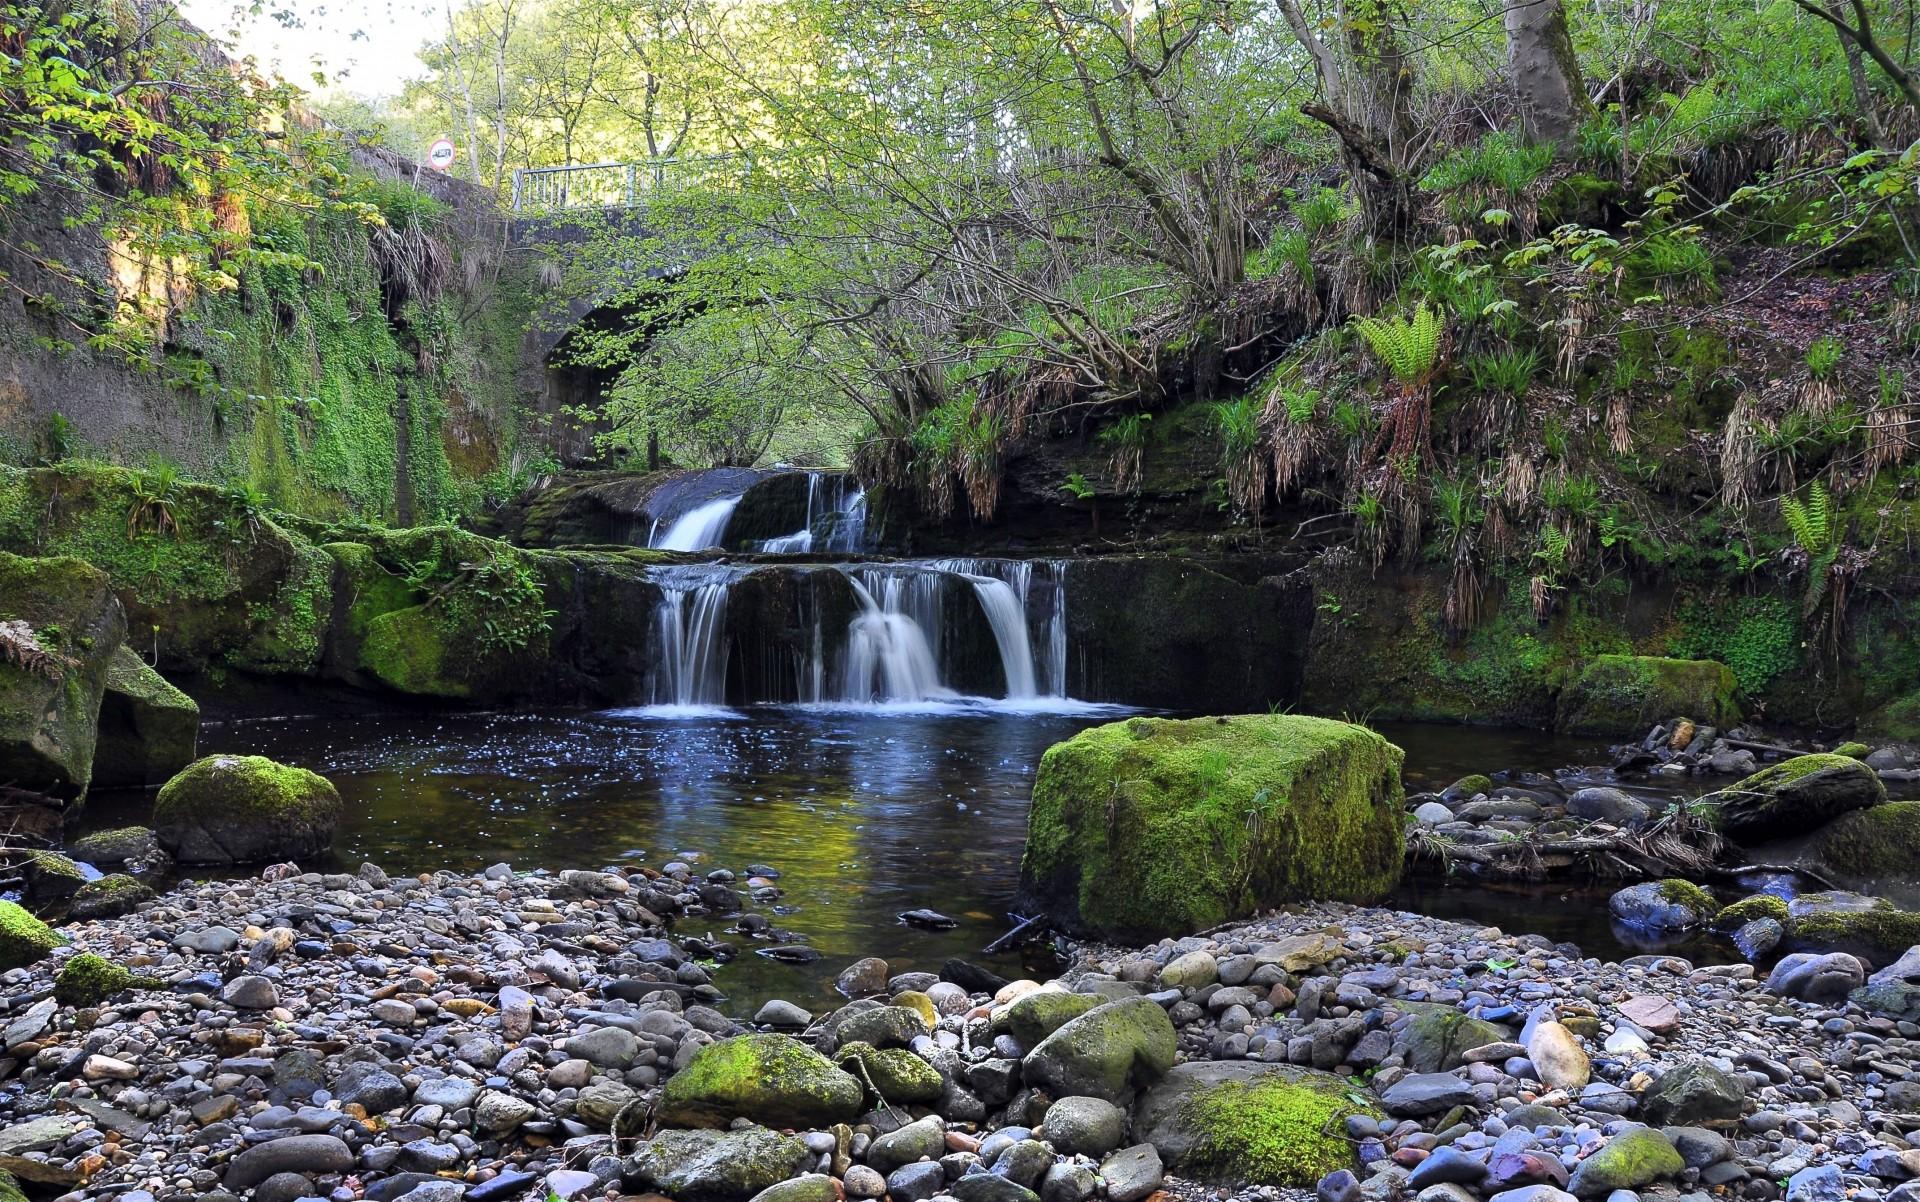 водопад деревья камни бесплатно